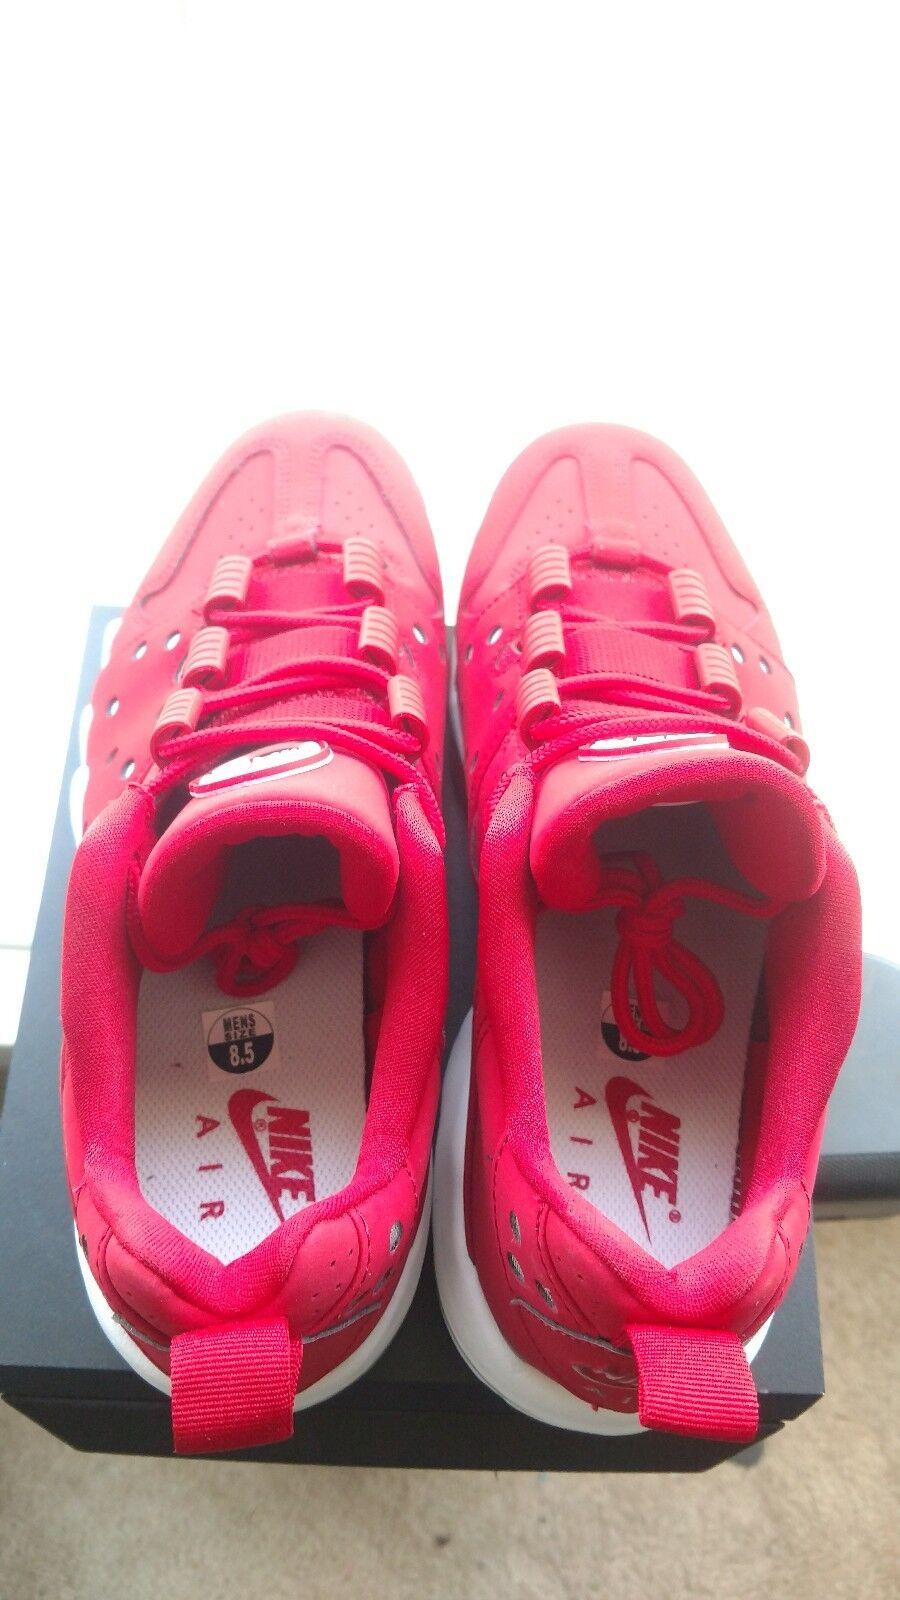 Nike Air Max '94 Charles Barkley (CB) Low (red/white) Men's Sz 8.5 [917752-600]